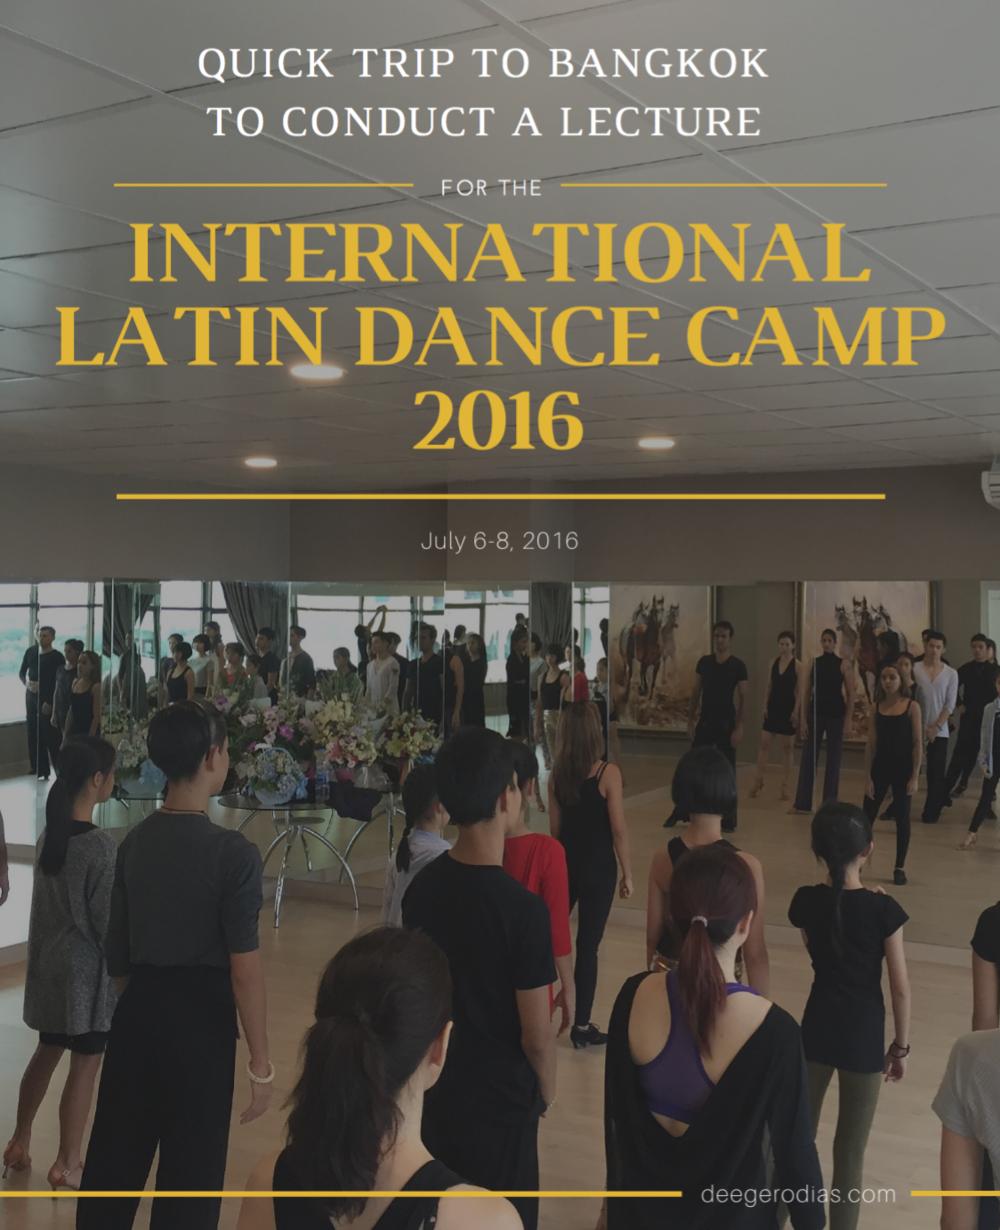 bangkok-international-latin-dance-camp